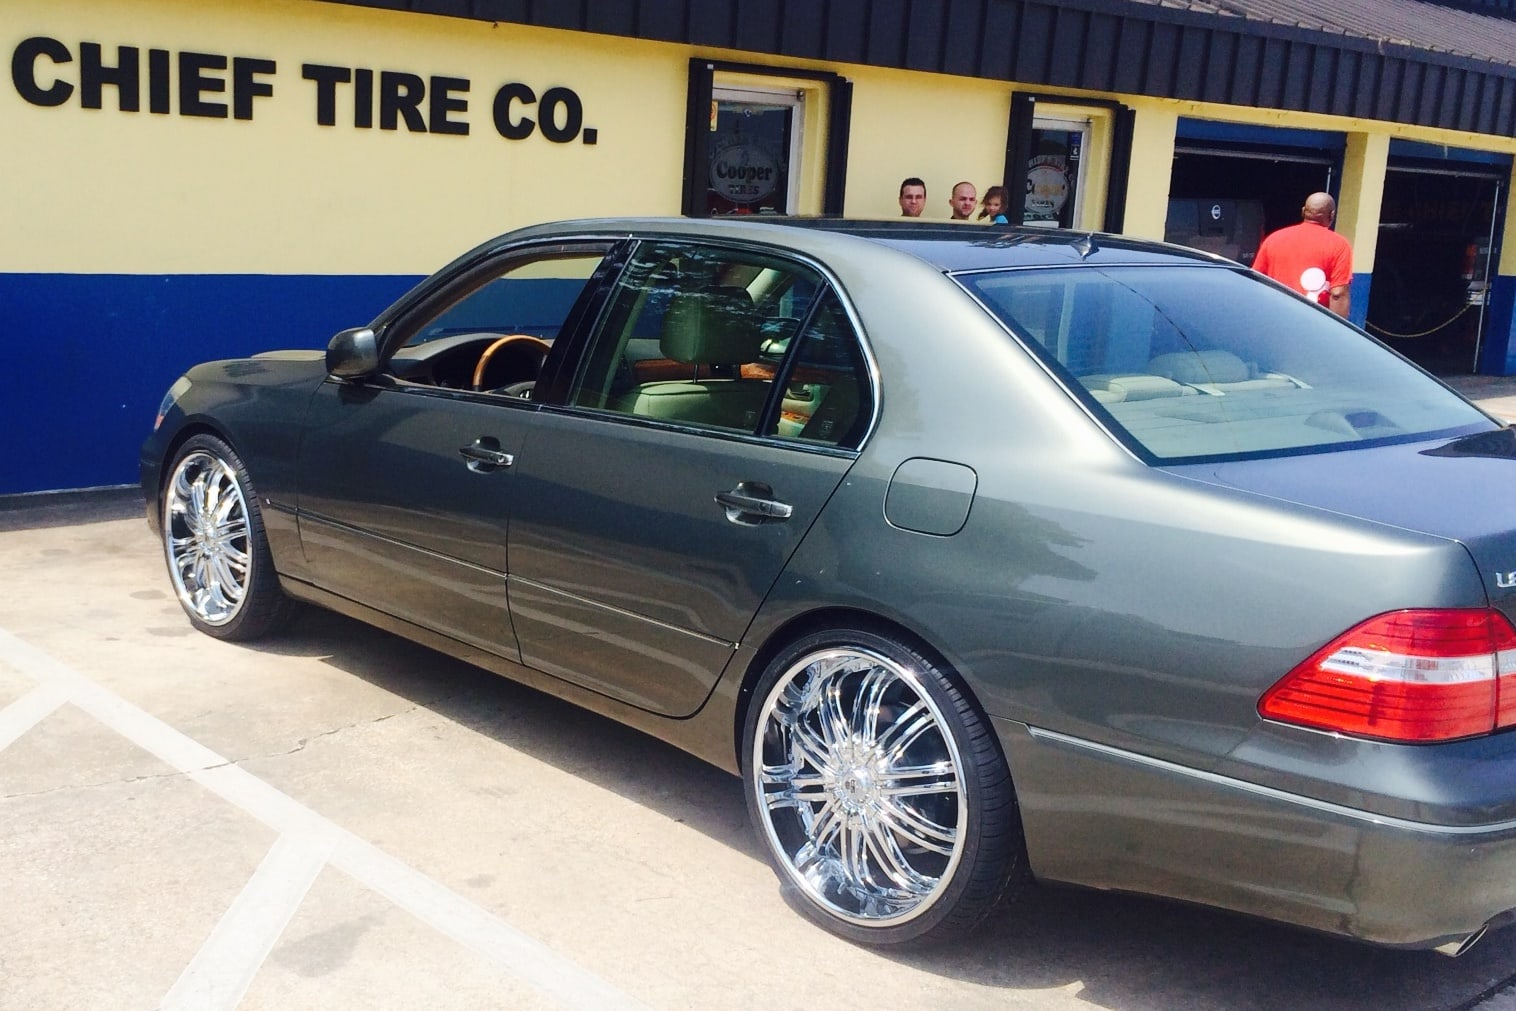 Ls430 1016038 2 Big Chief Tire